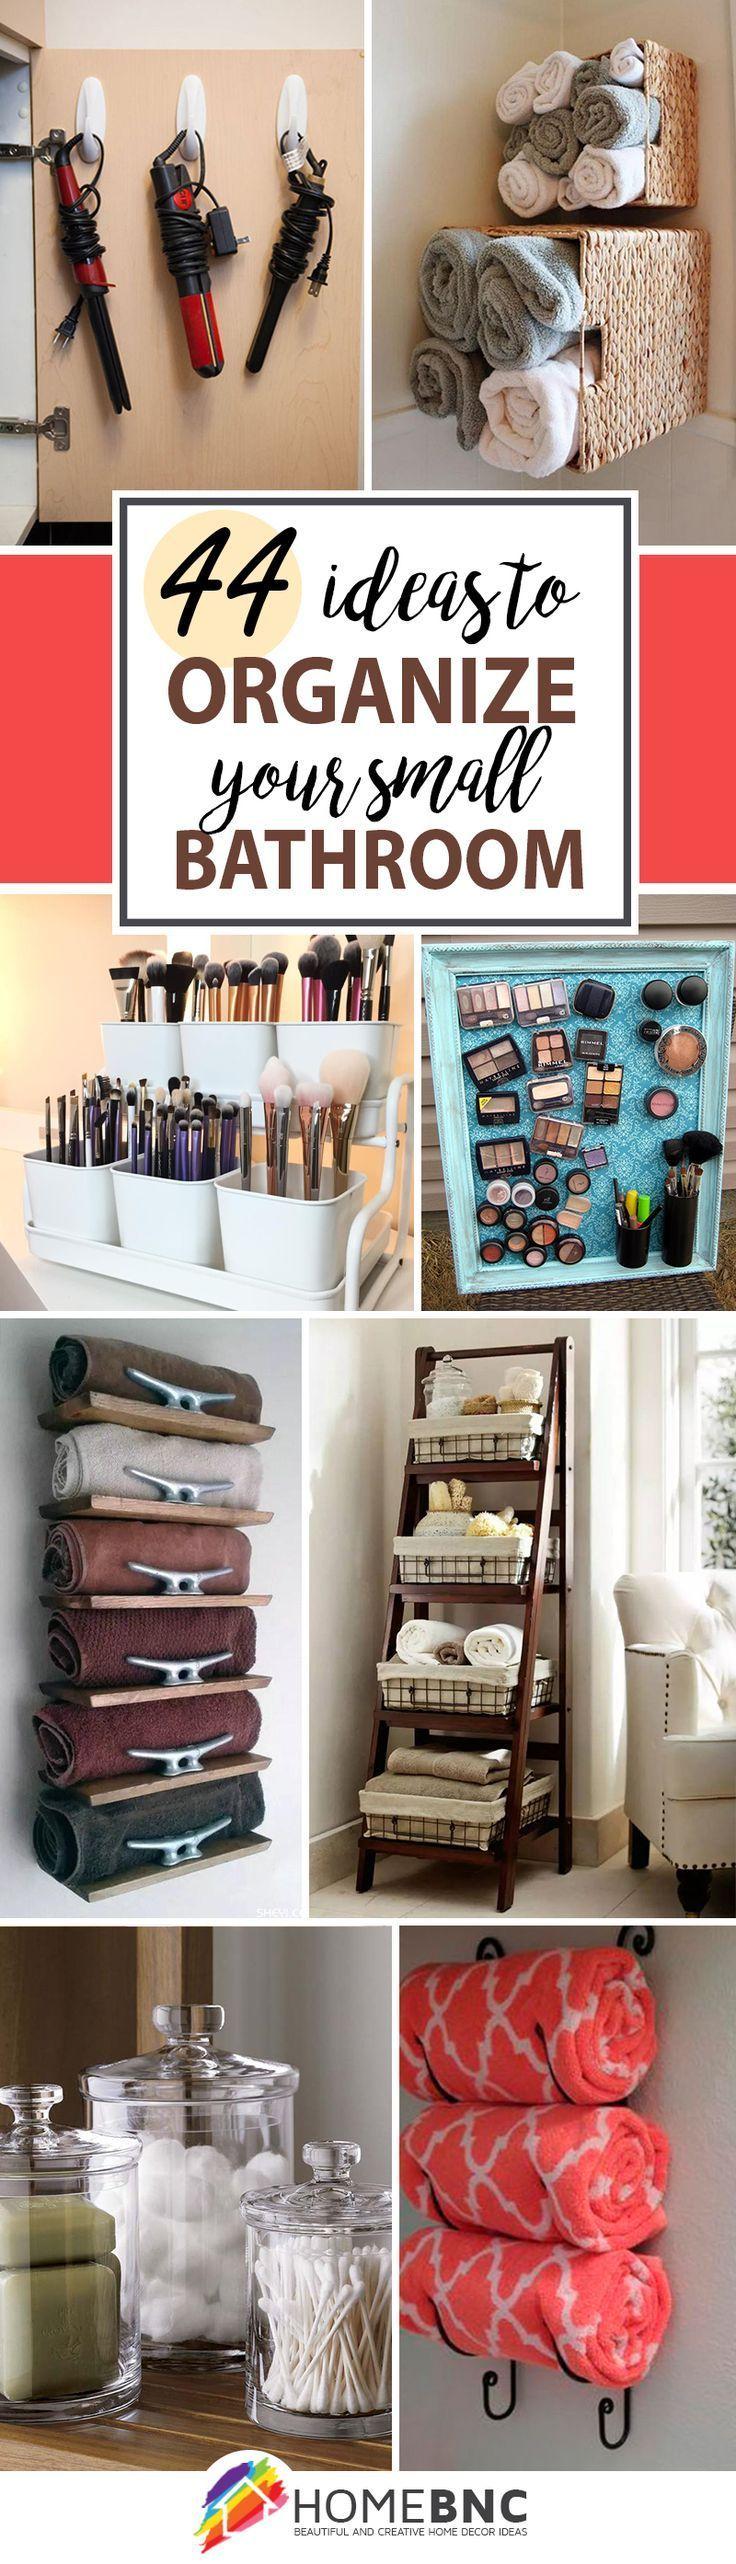 44 Crazy and Beautiful Tiny Powder Room